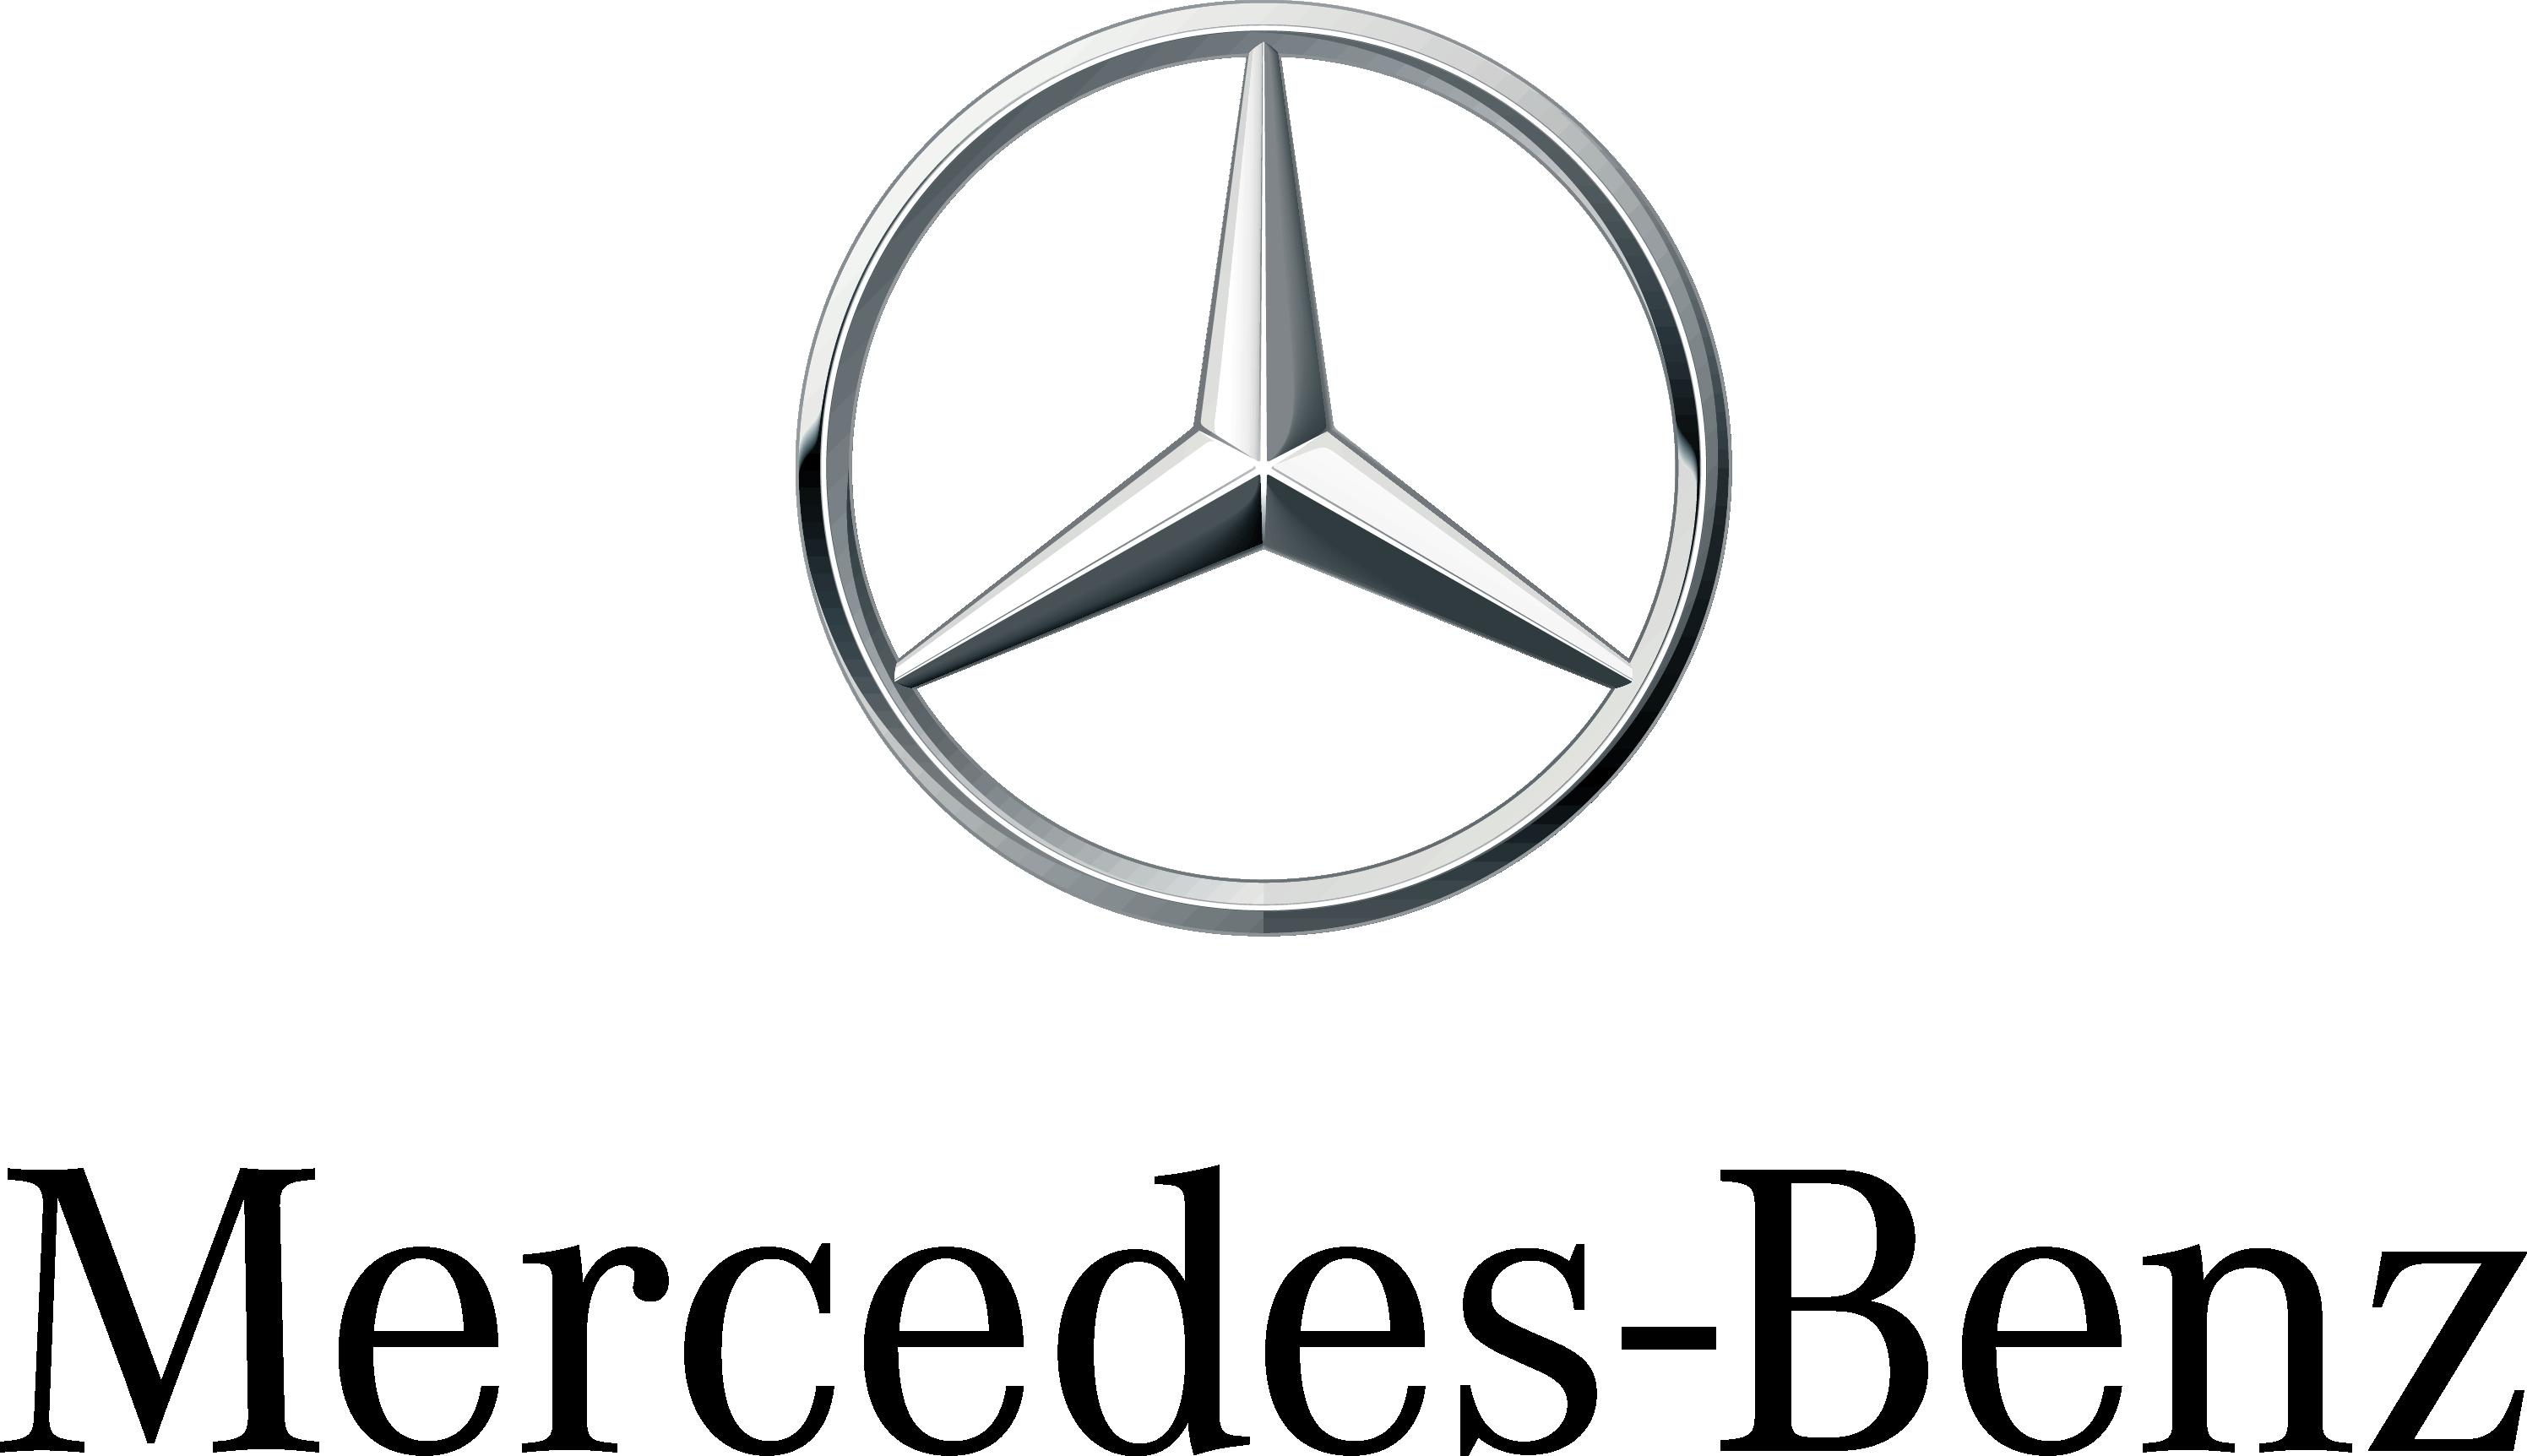 mercedes-benz-logo-png-mercedes-benz-logo-2992